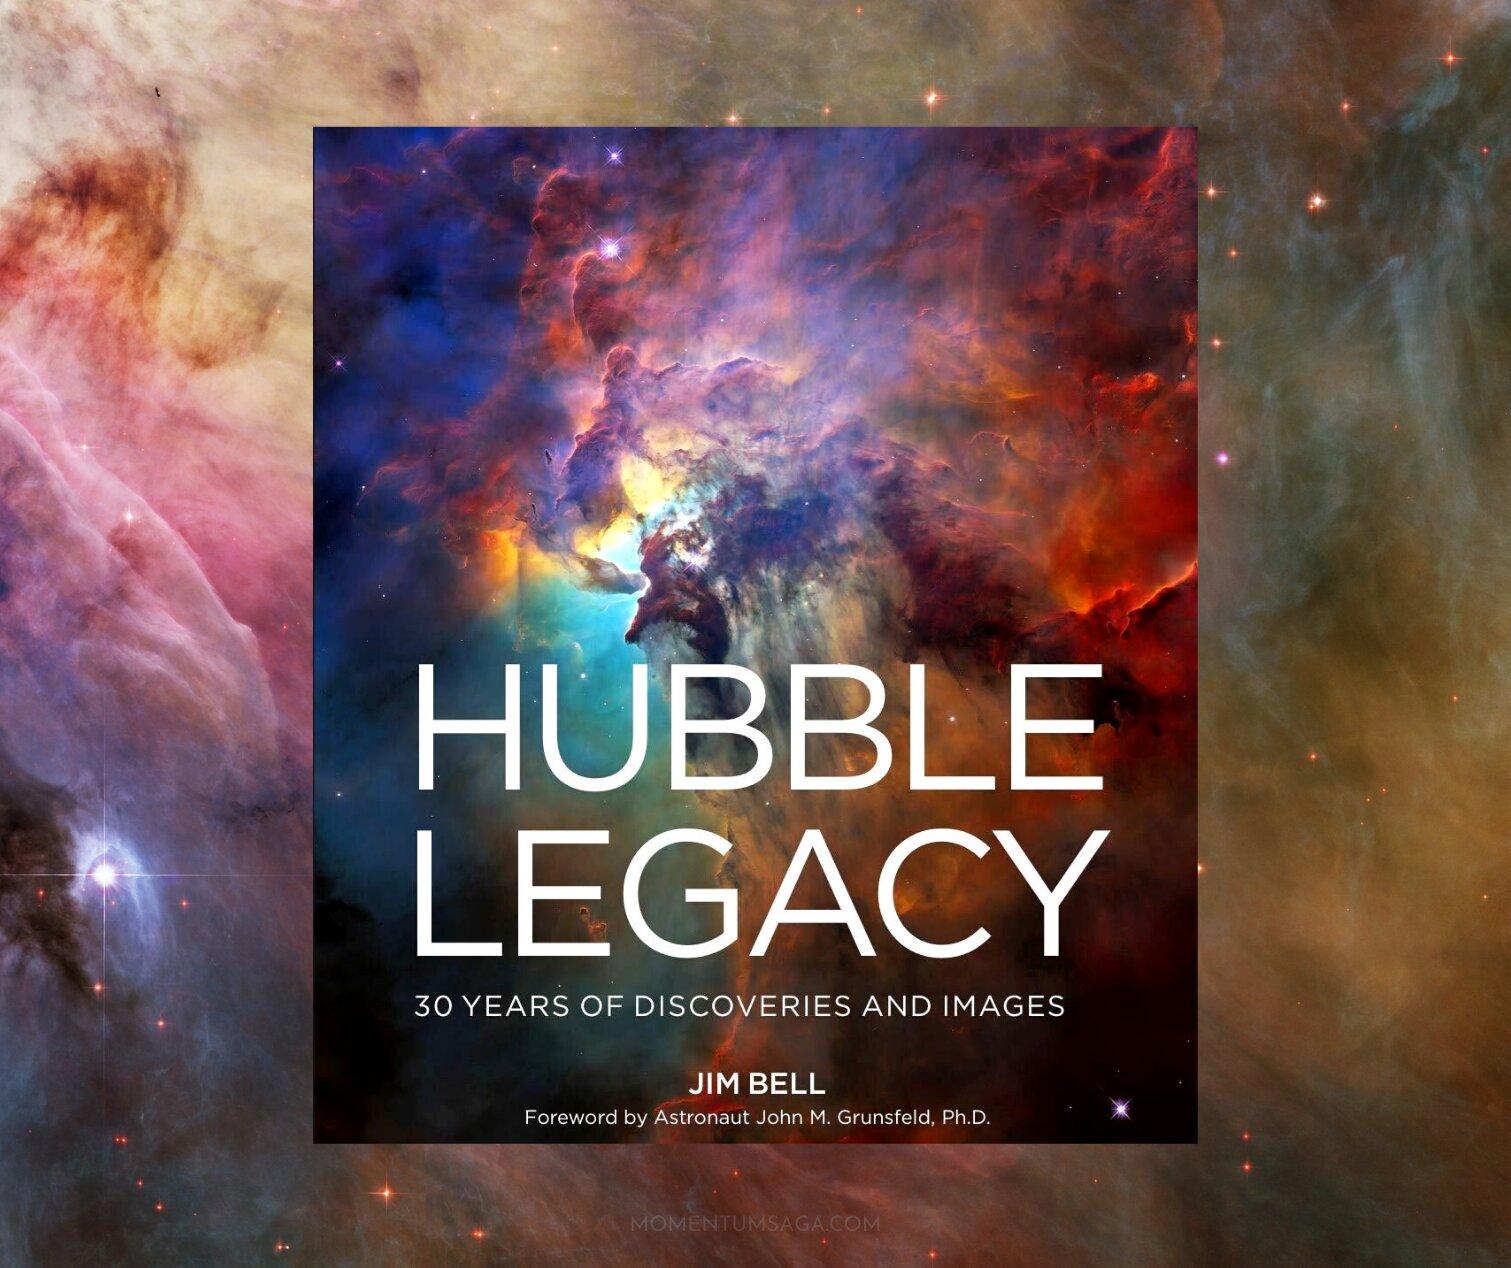 Resenha: Hubble Legacy, de Jim Bell